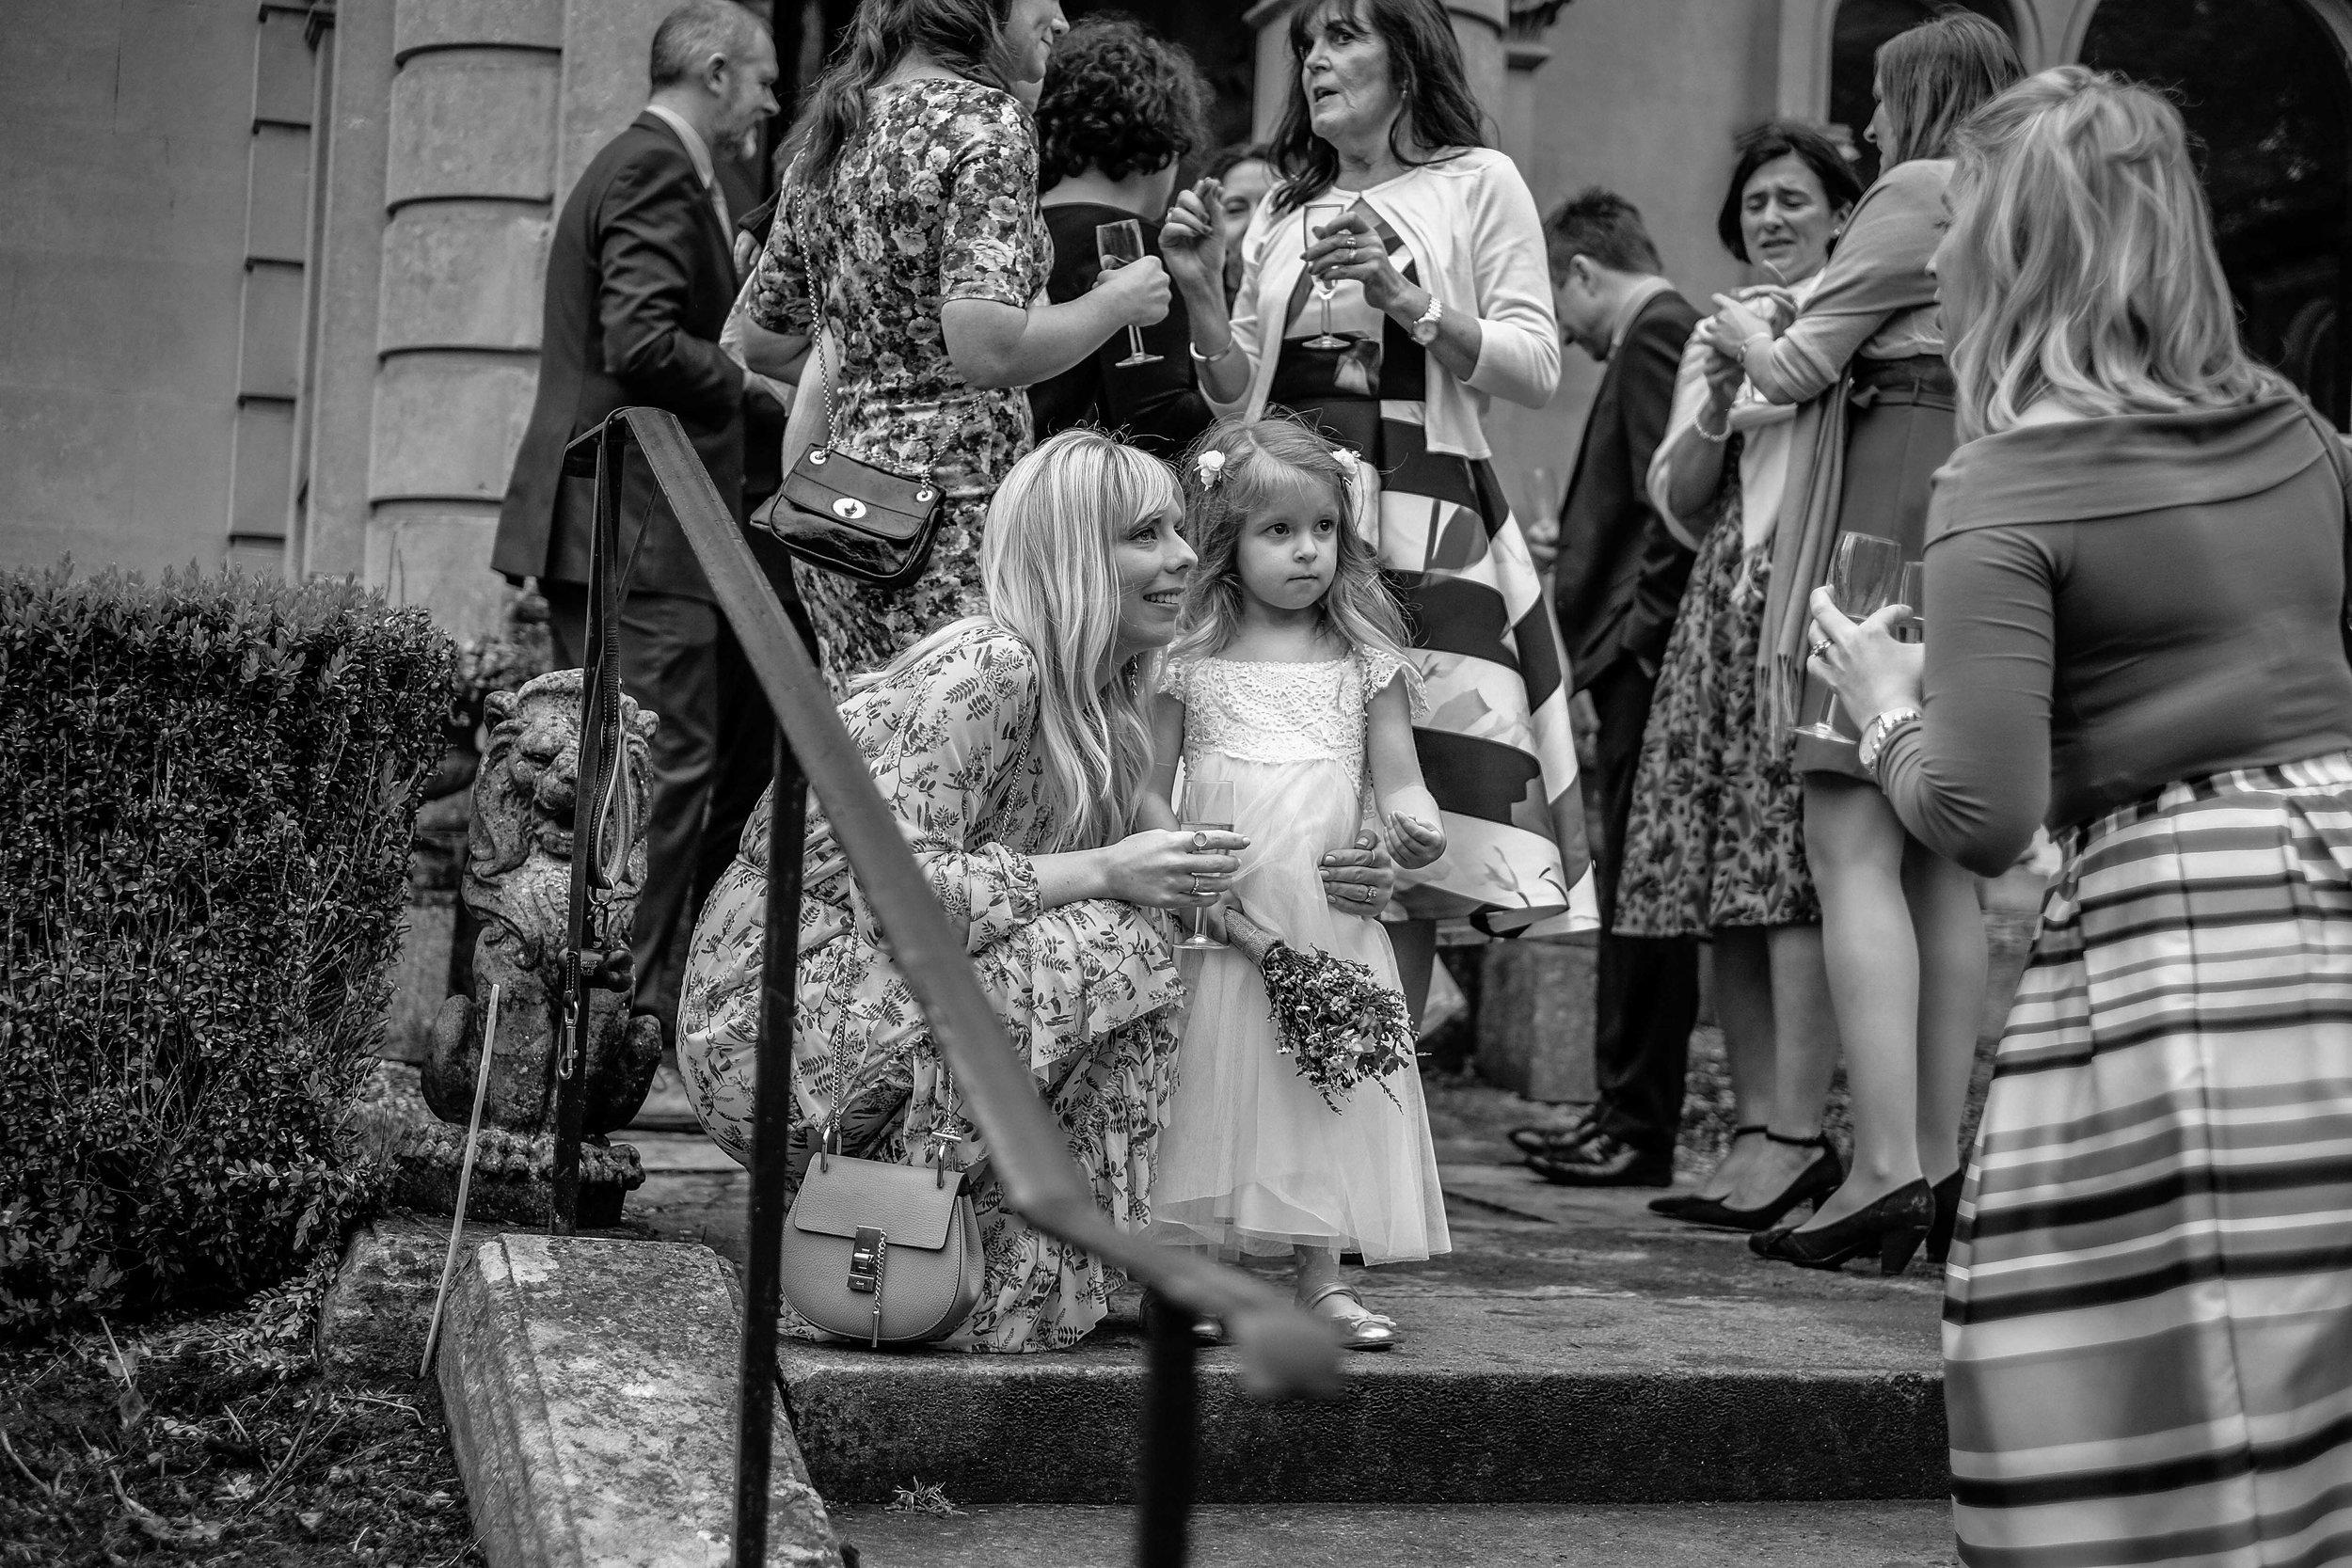 Beechfield house weddings - Abby and Greg (153 of 208).jpg